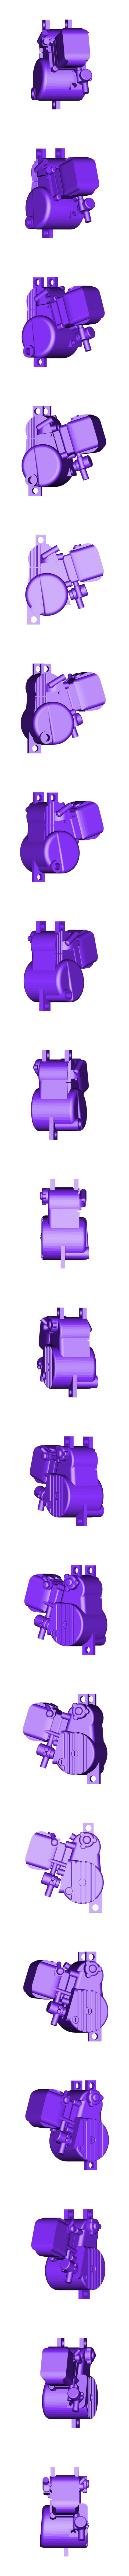 moter.stl Download free STL file quad (custom) • 3D printing design, jasperbaudoin